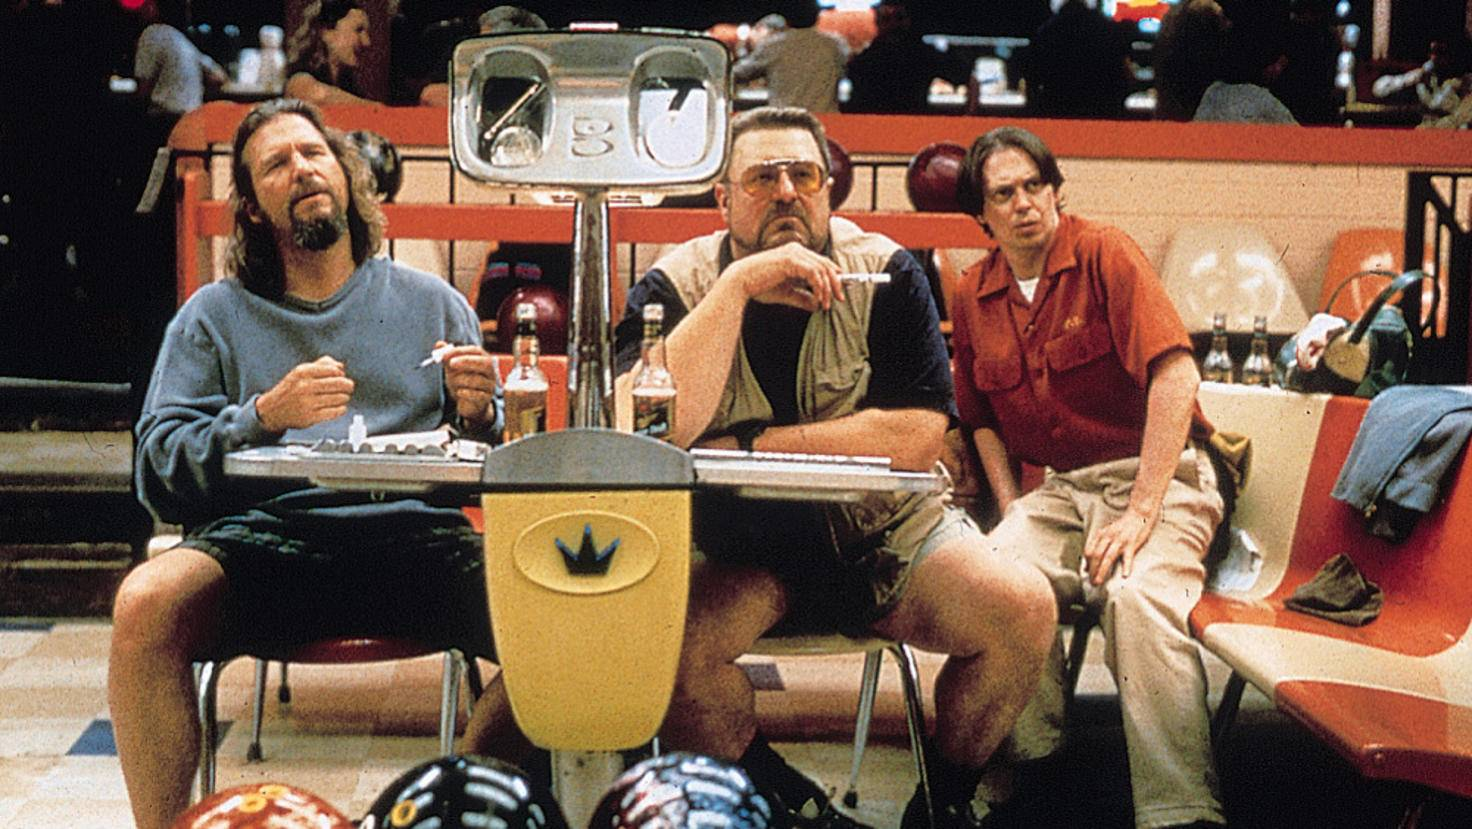 Der Dude (Jeff Bridges), Wlater (John Goodman) und Donny (Steve Buscemi) bei ihrer Lieblingsbeschäftigung: Bowling.